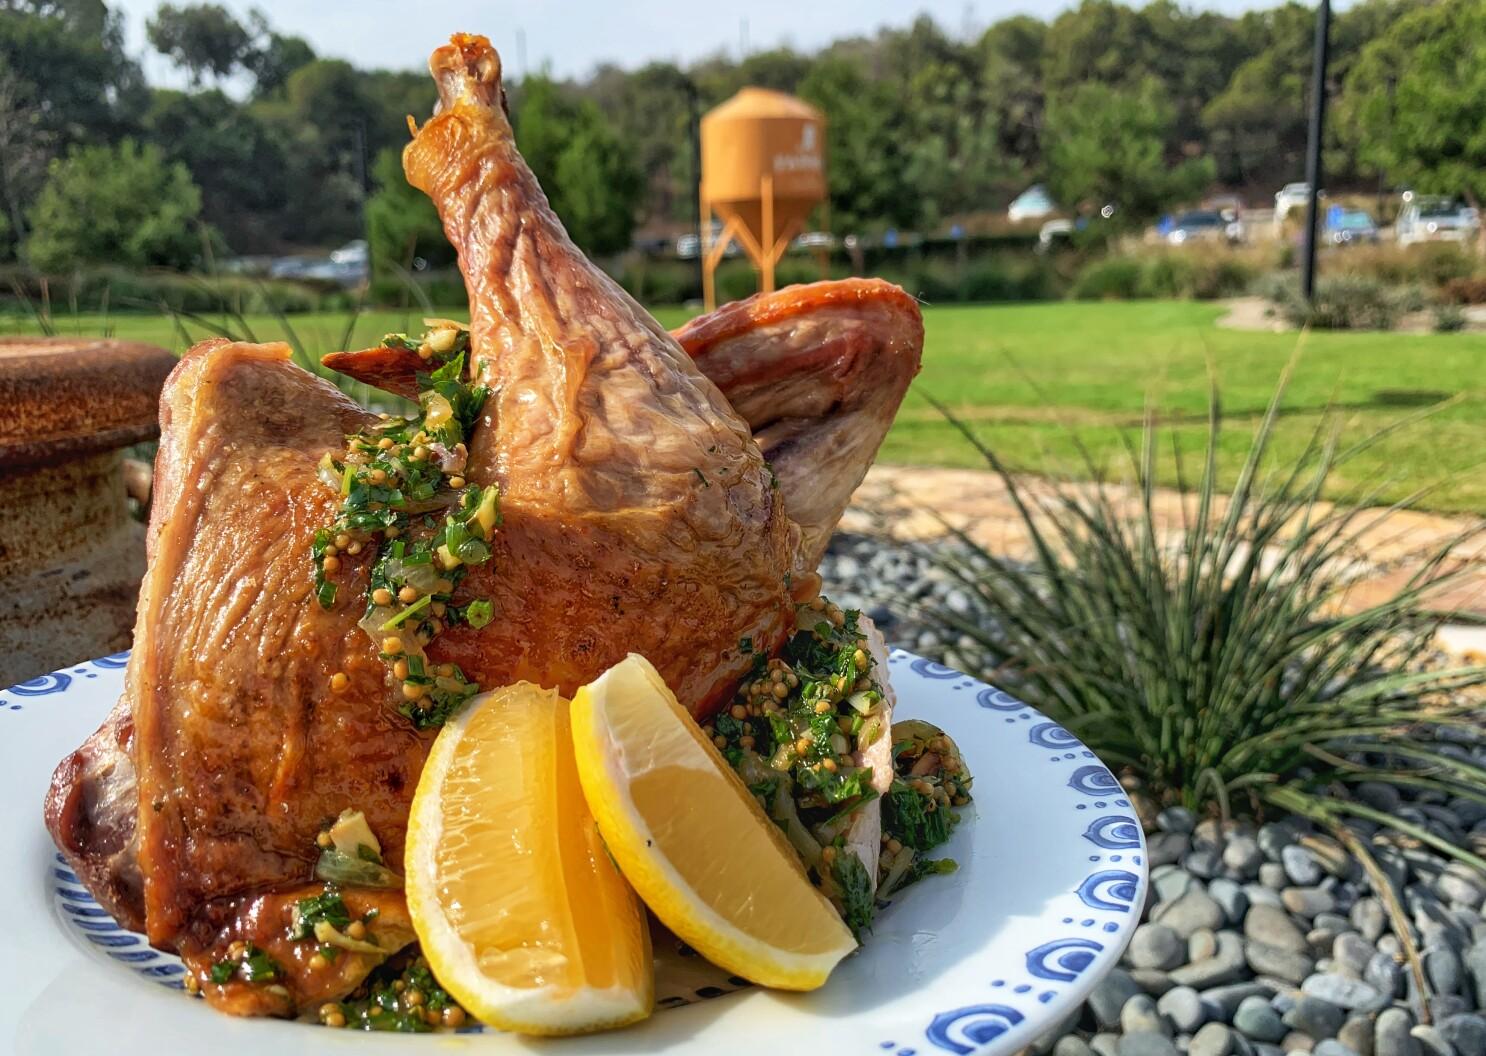 Turkey and gravy get West Coast treatment